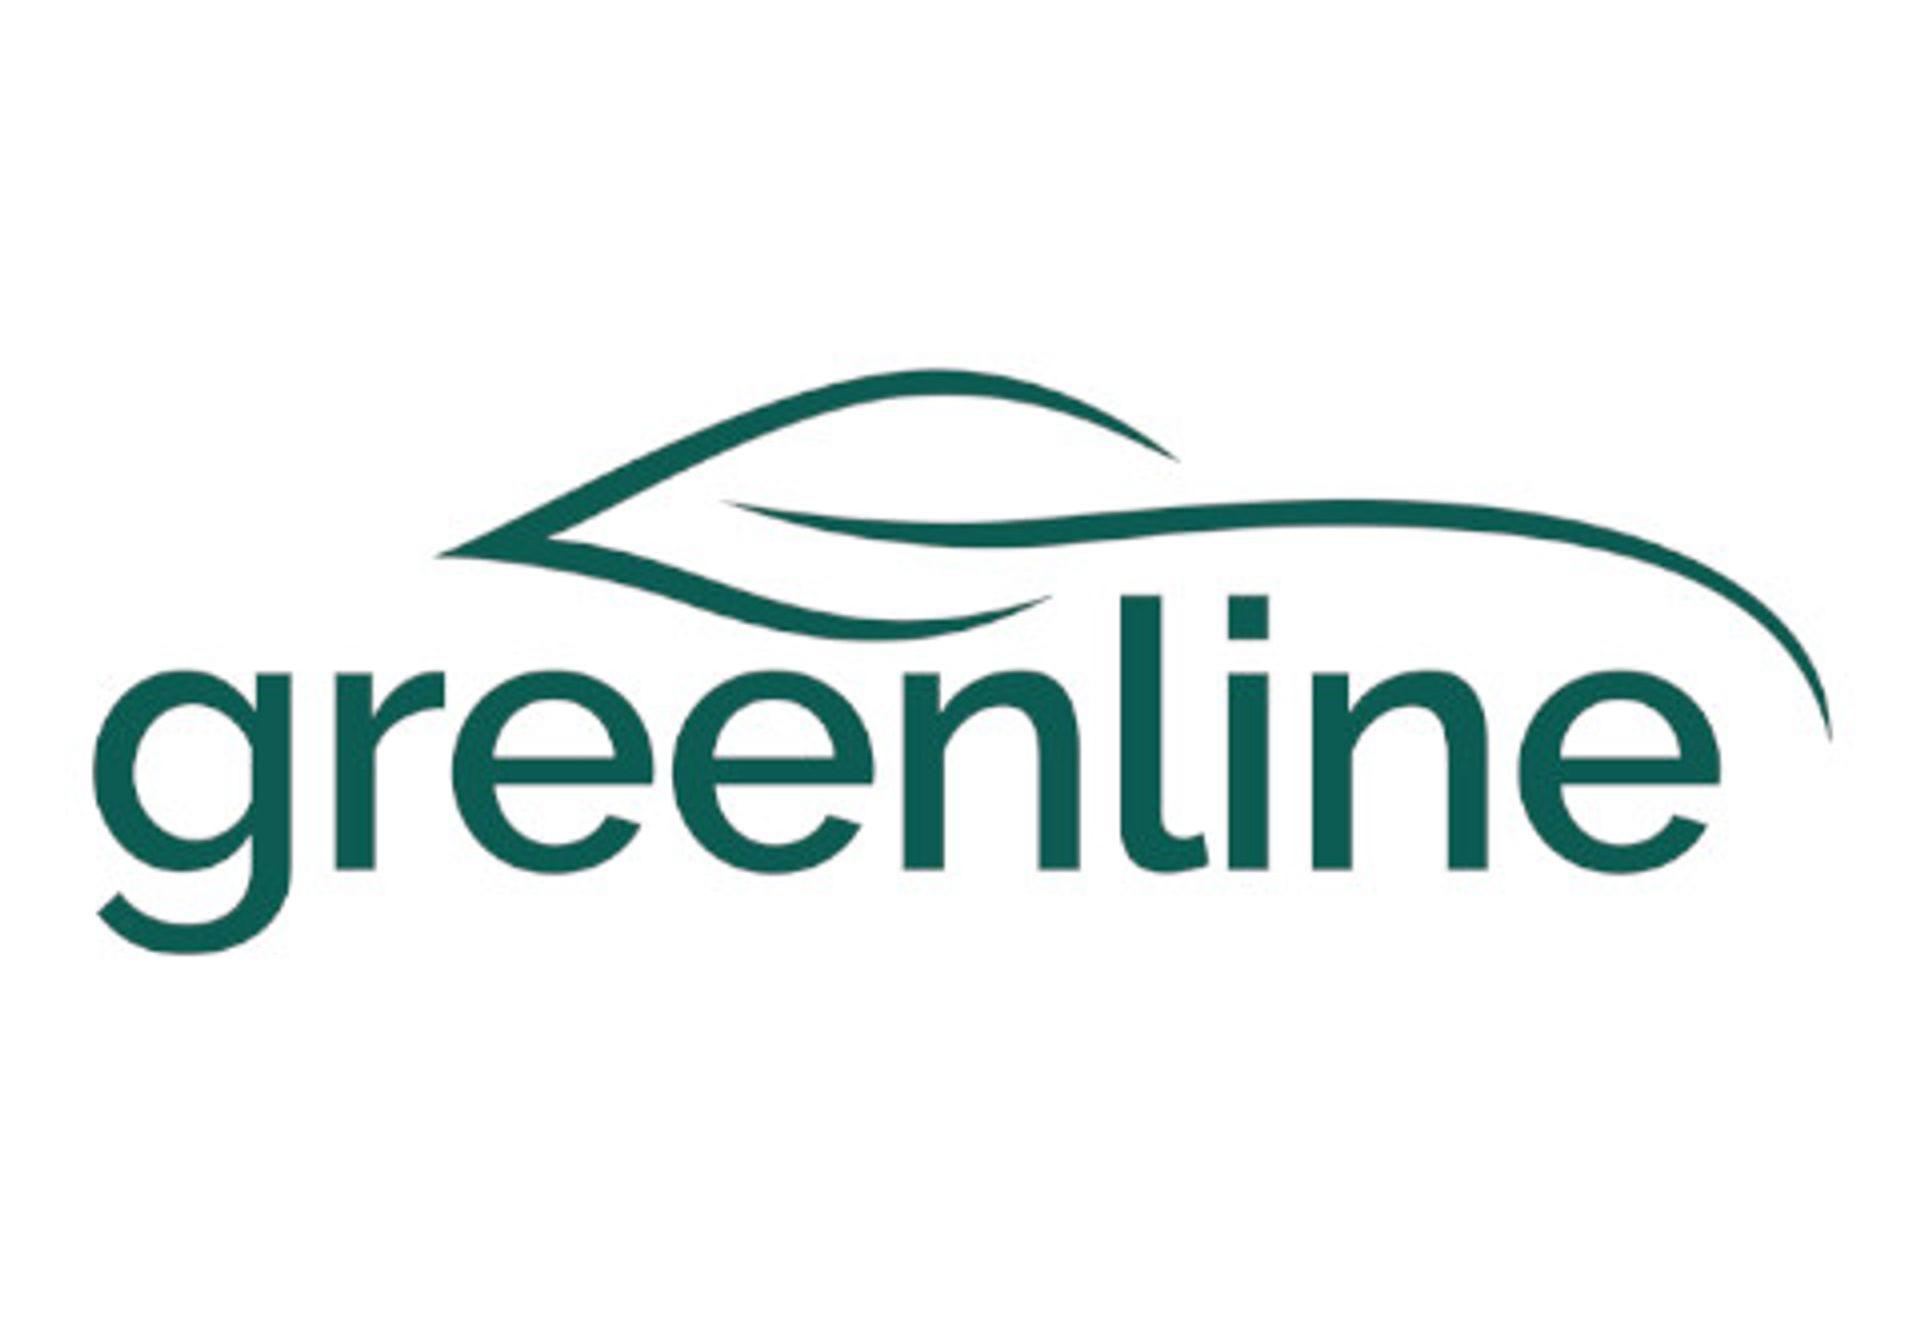 Greenline Clean